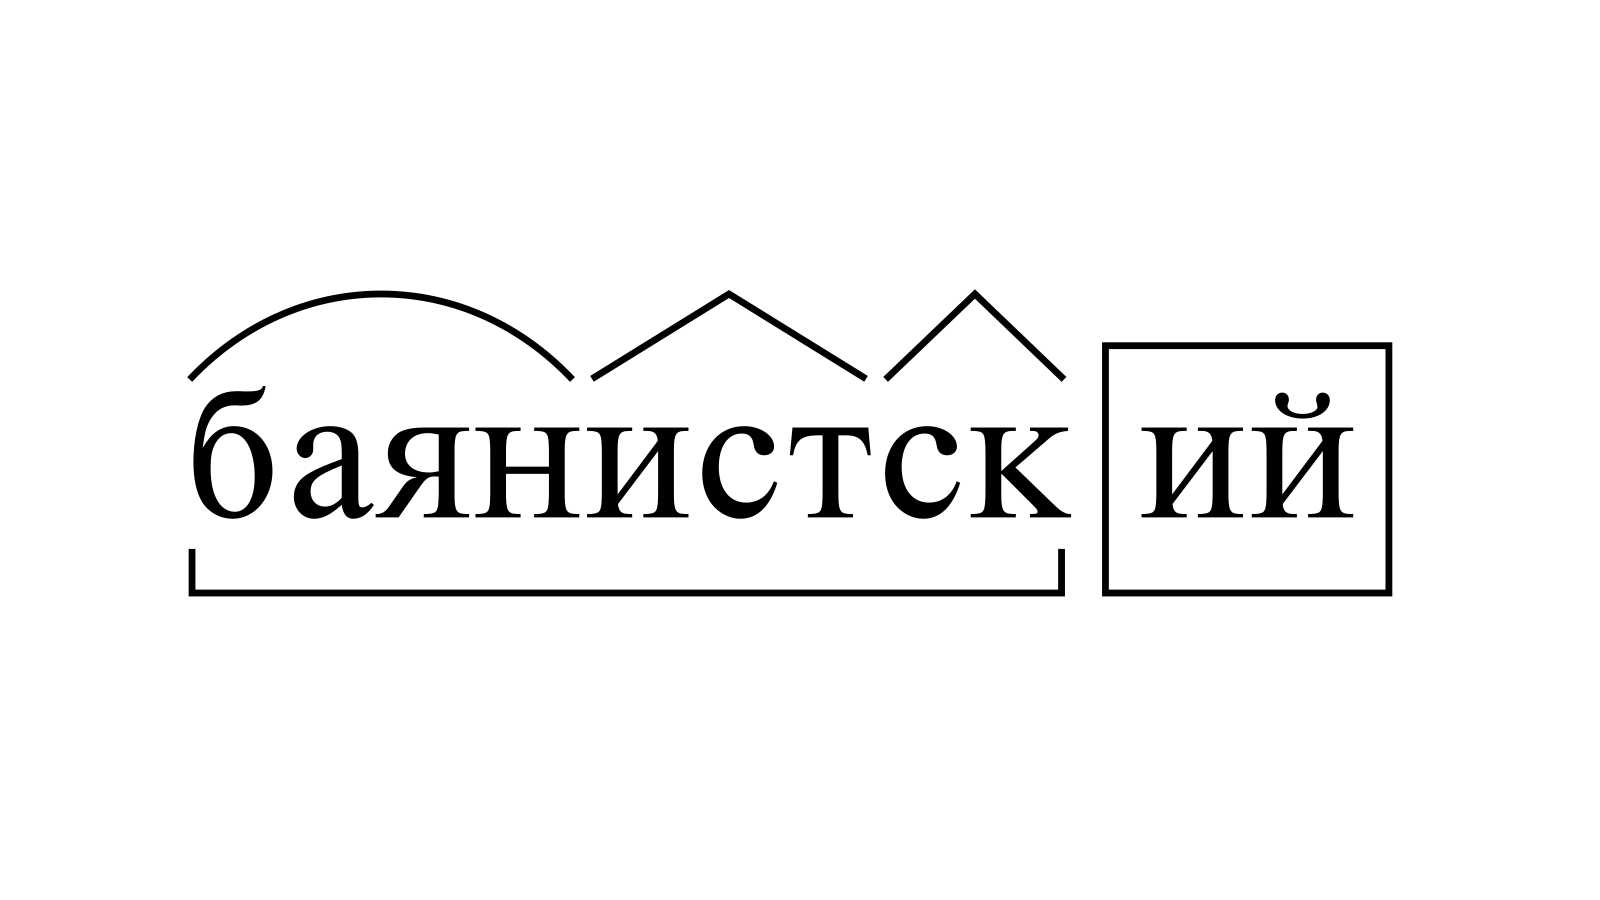 Разбор слова «баянистский» по составу